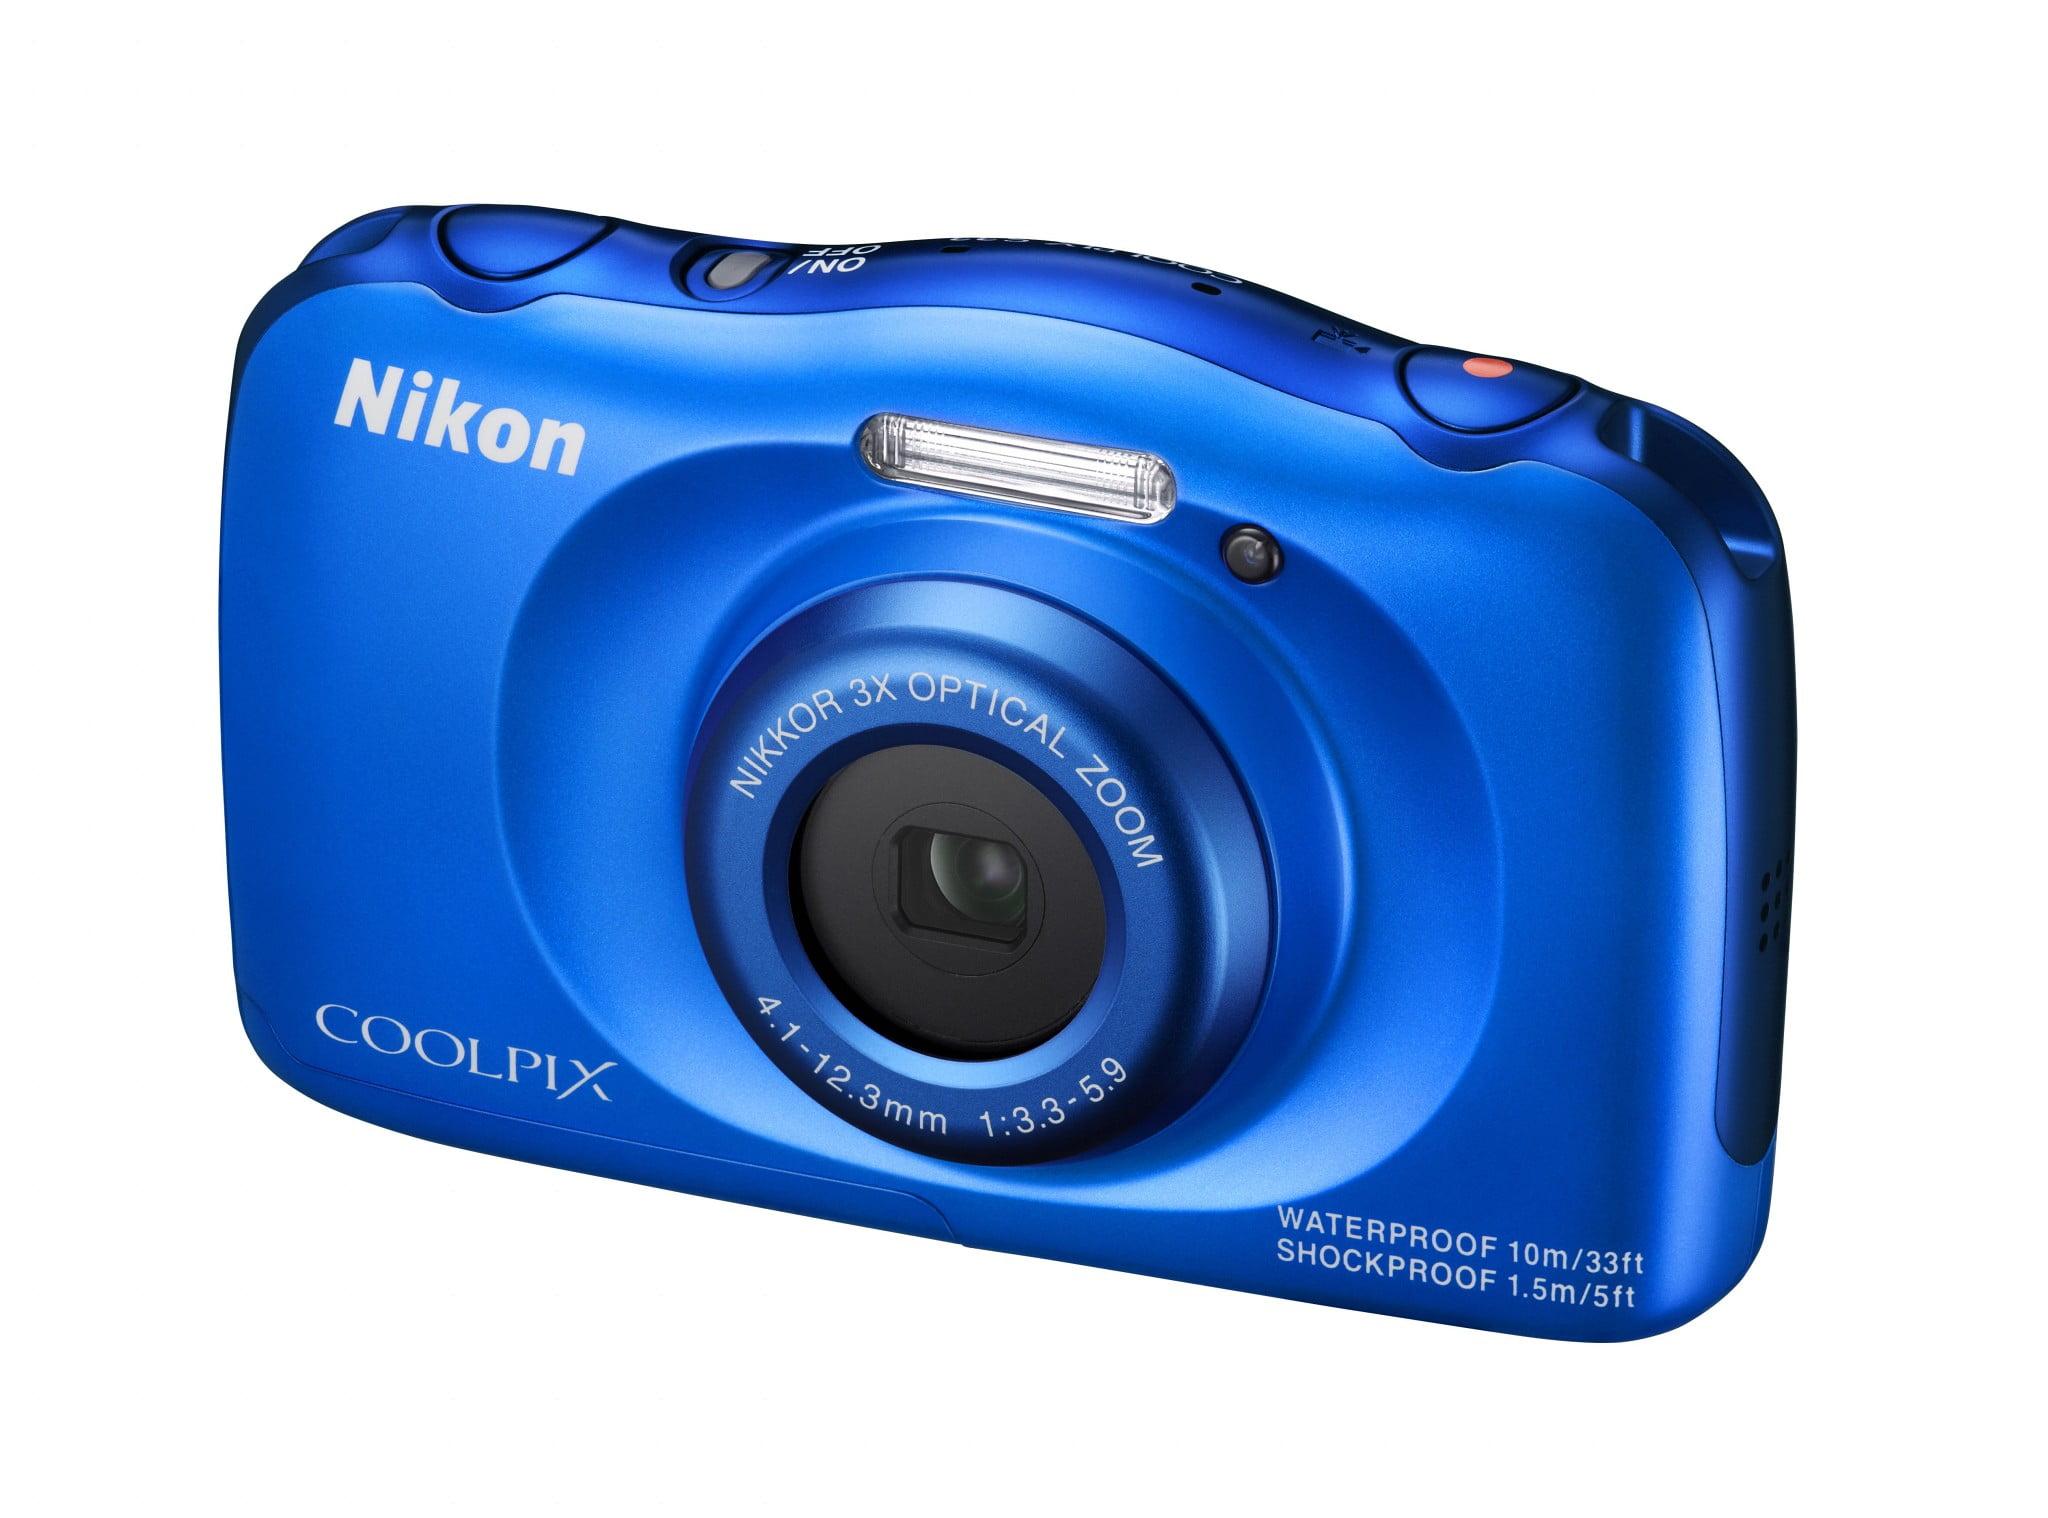 Nikon Coolpix S33